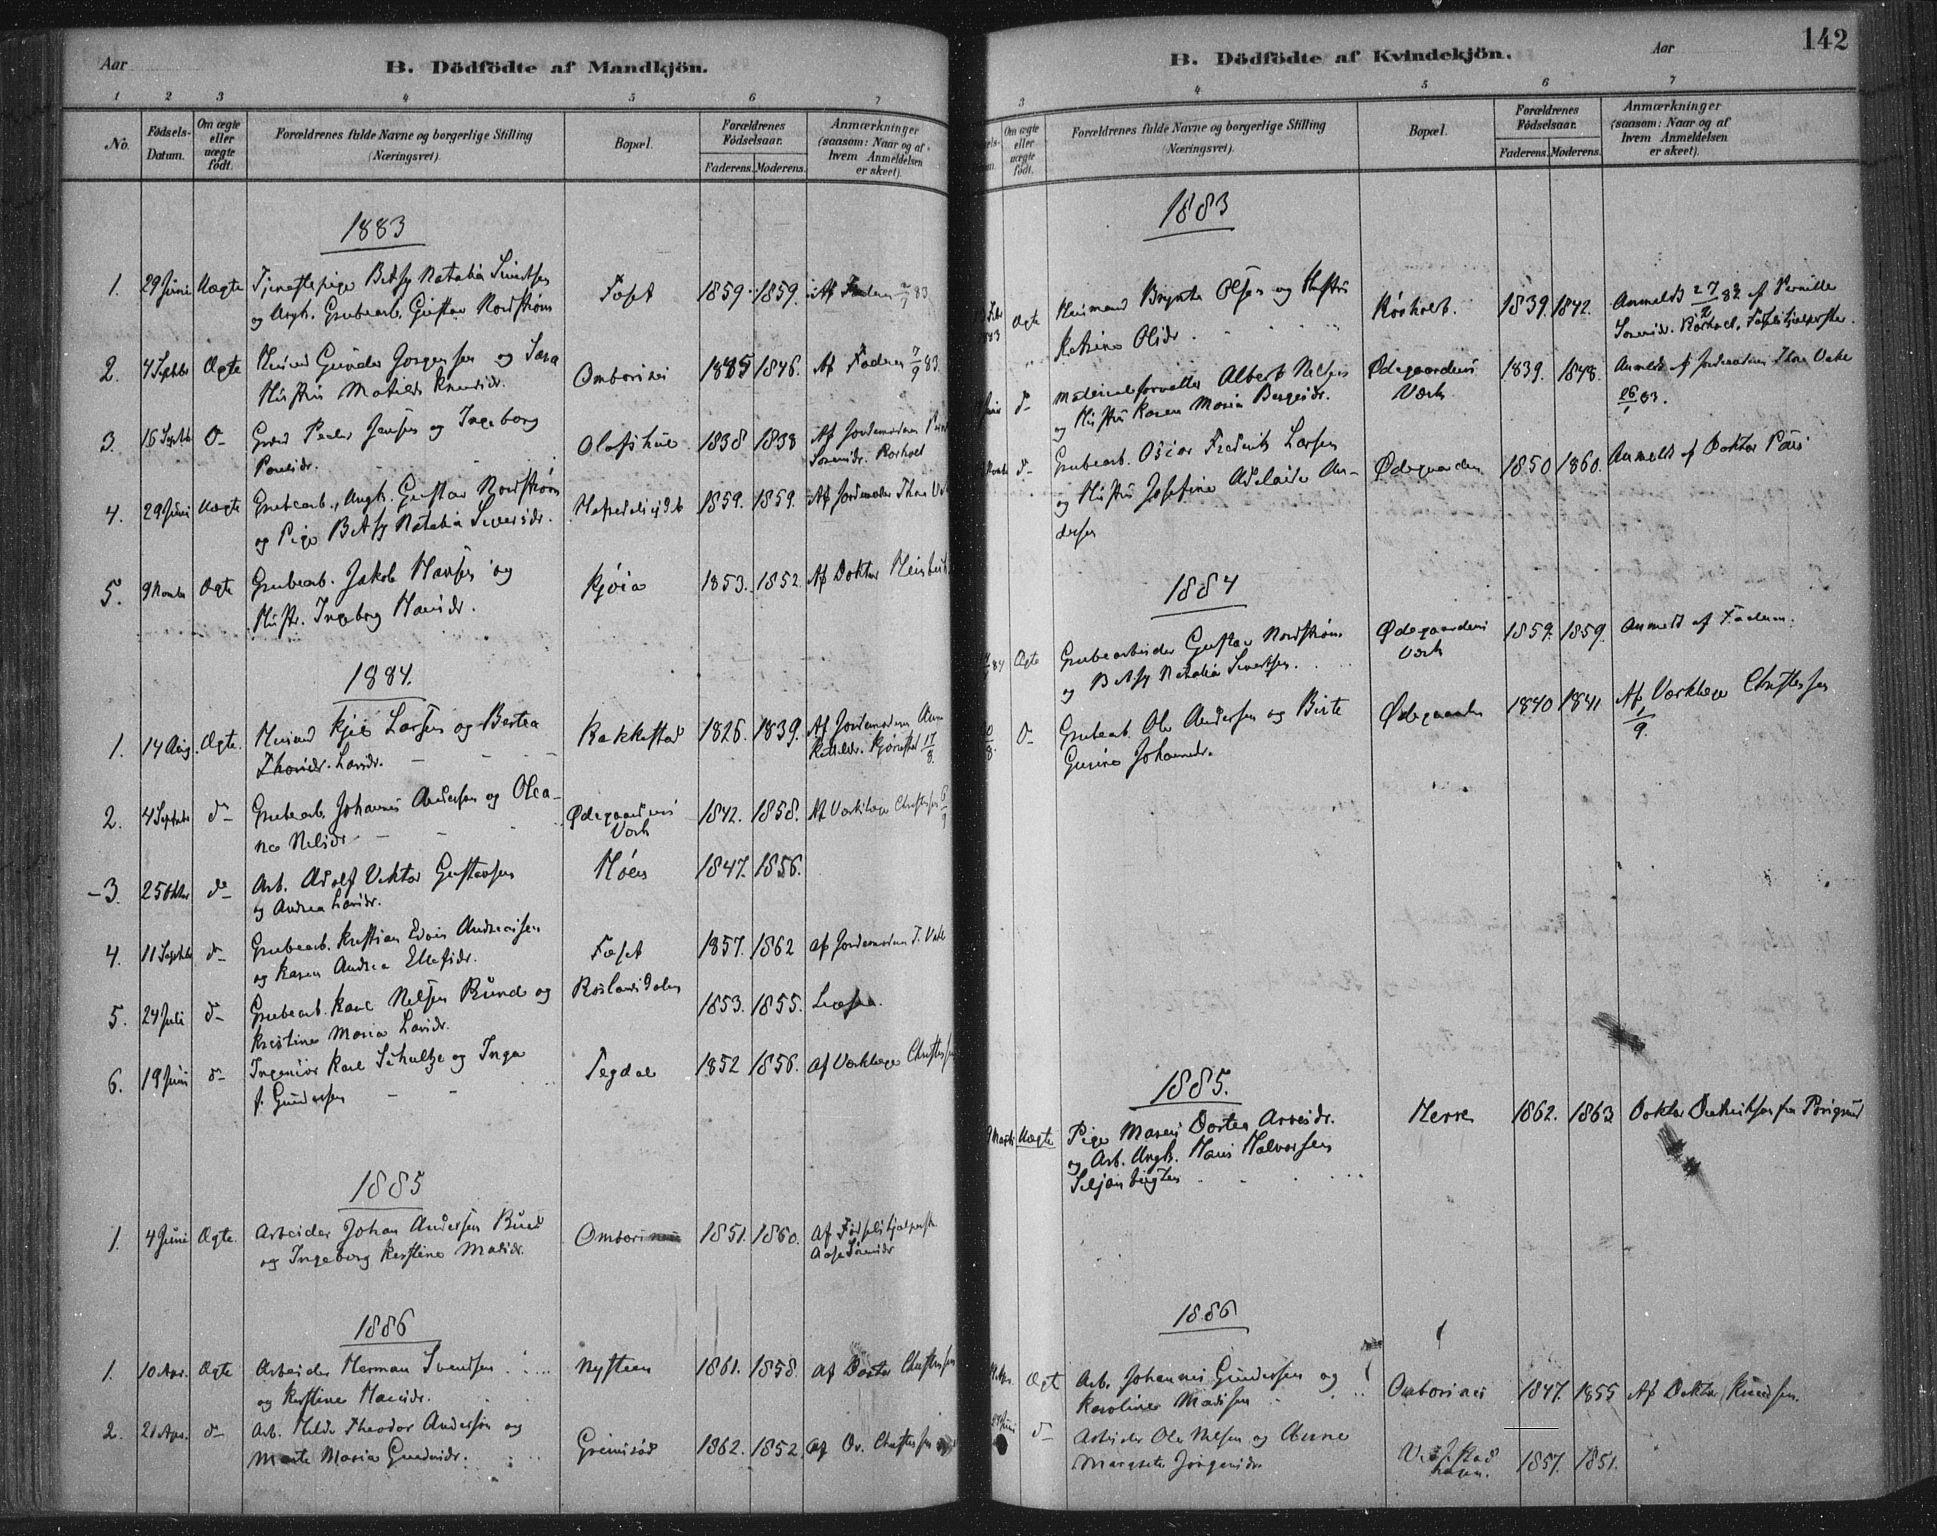 SAKO, Bamble kirkebøker, F/Fa/L0007: Ministerialbok nr. I 7, 1878-1888, s. 142